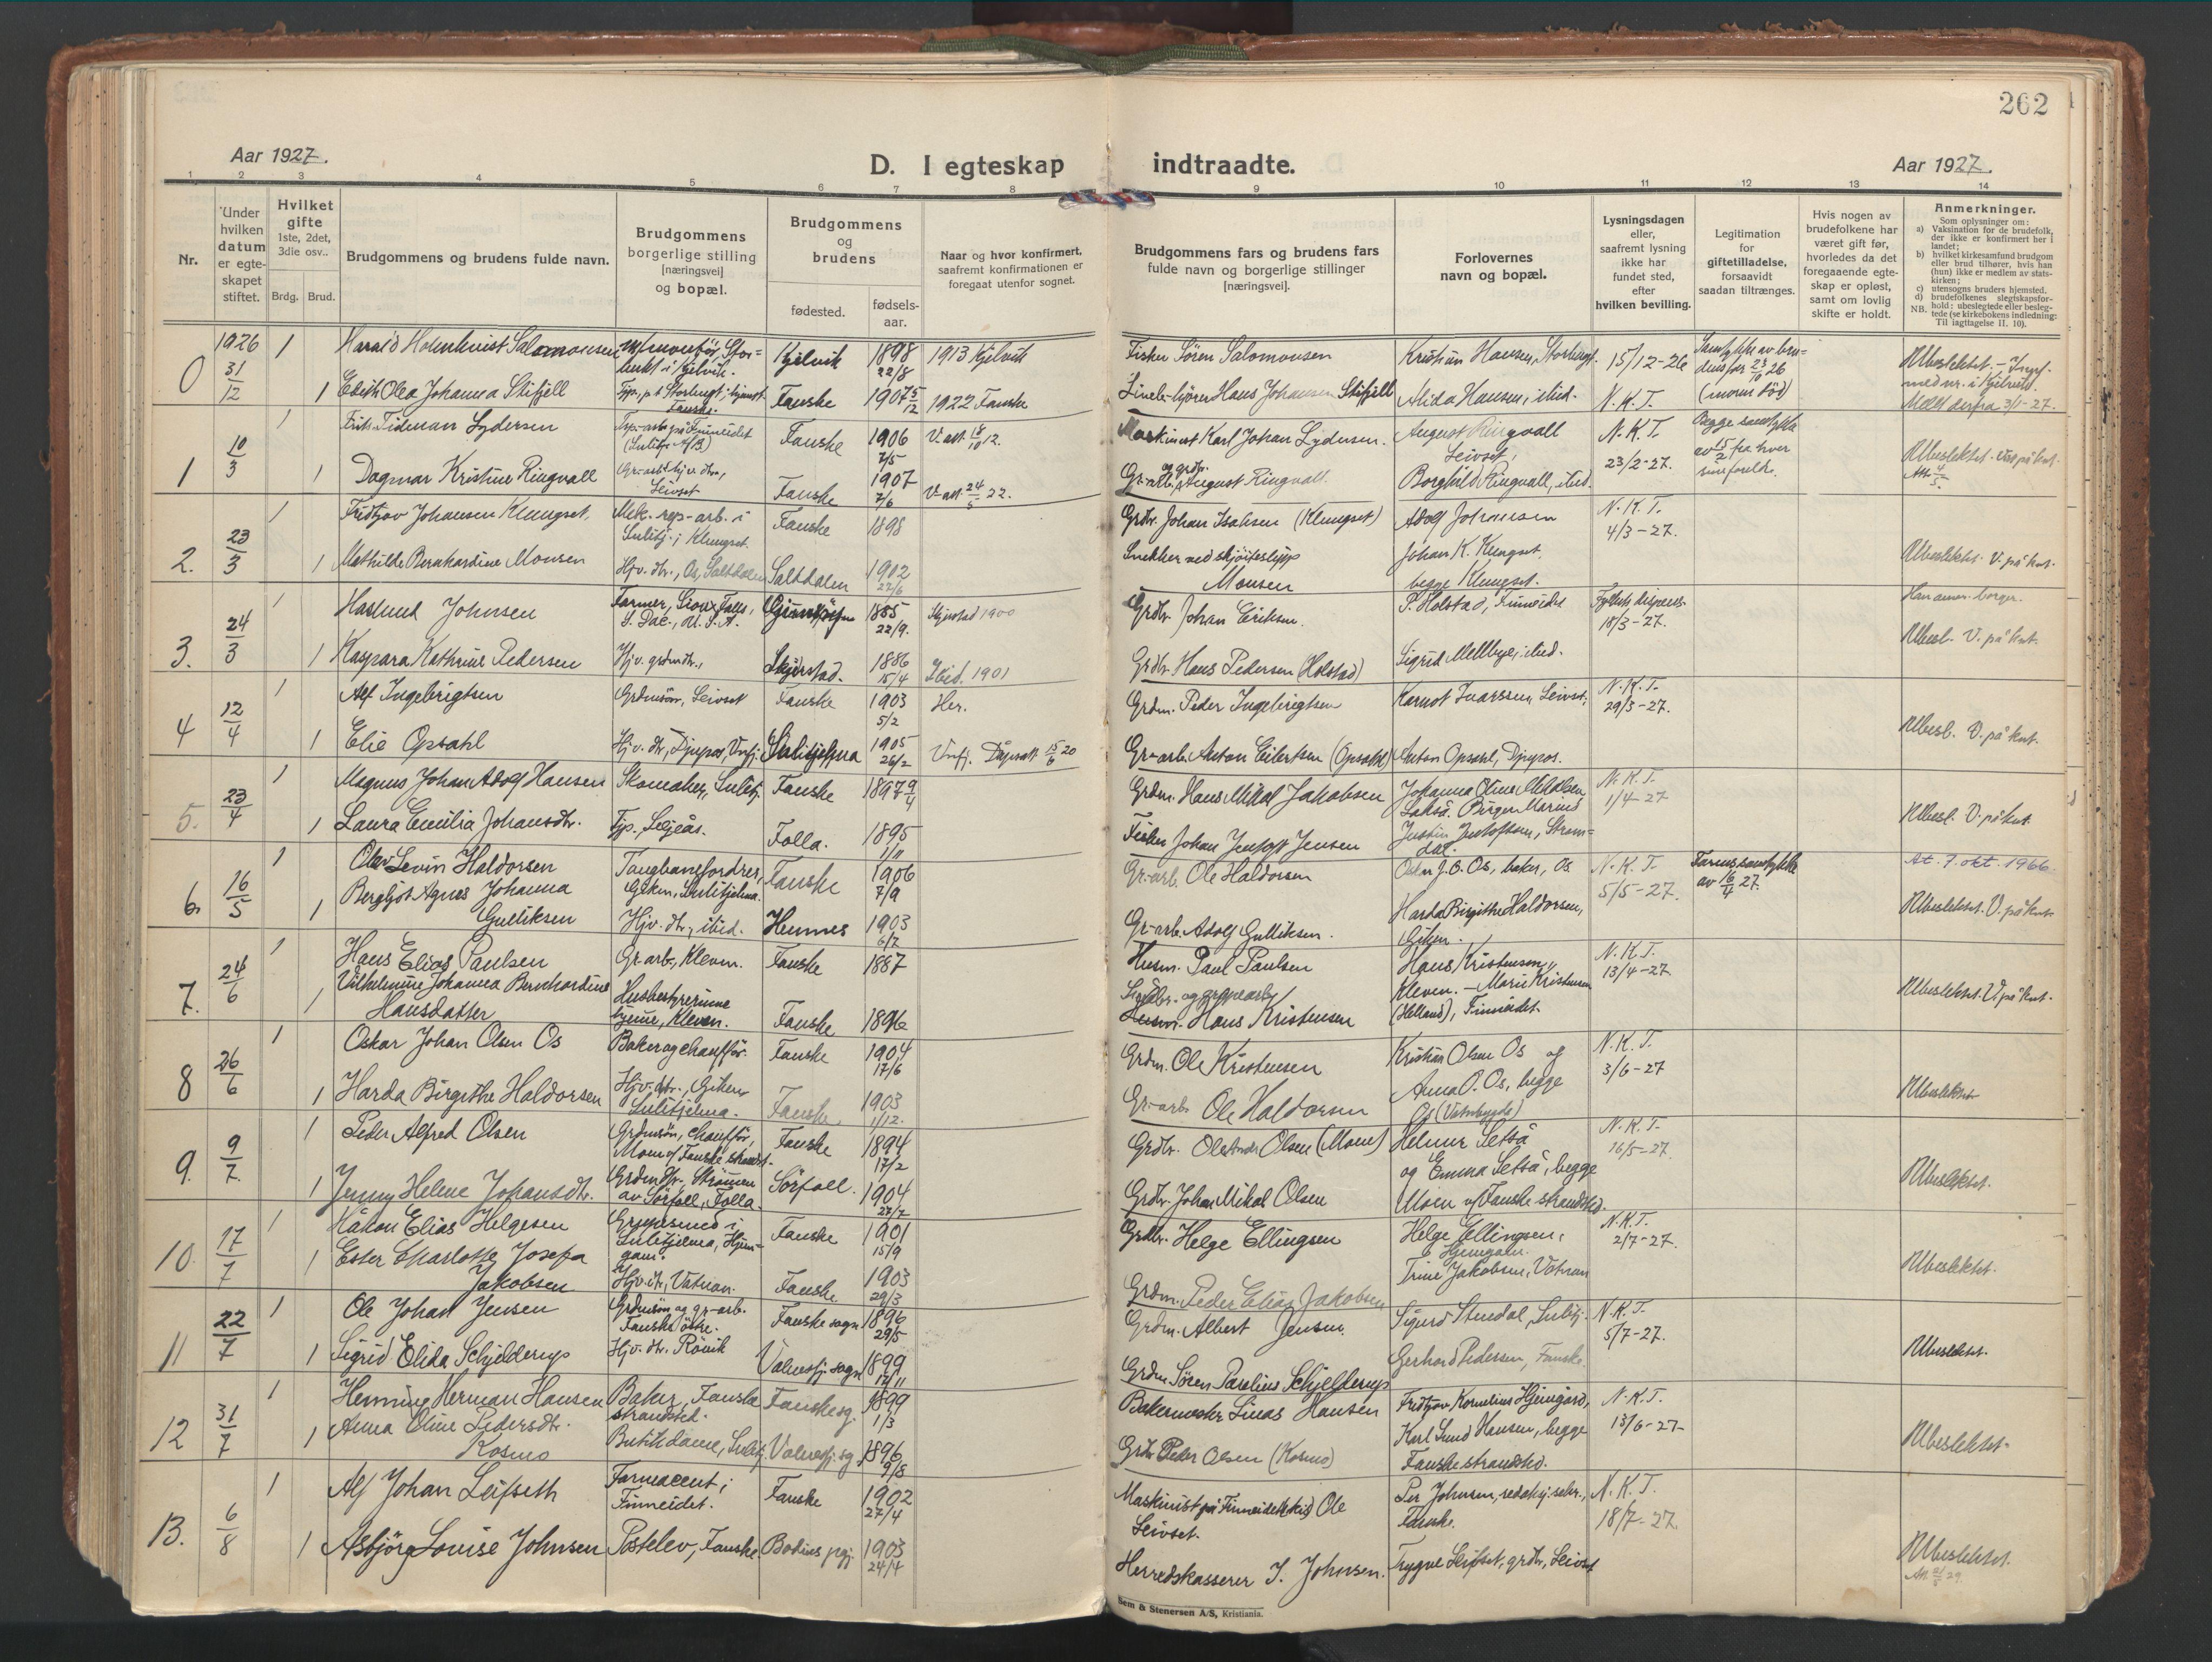 SAT, Ministerialprotokoller, klokkerbøker og fødselsregistre - Nordland, 849/L0699: Ministerialbok nr. 849A10, 1924-1937, s. 262